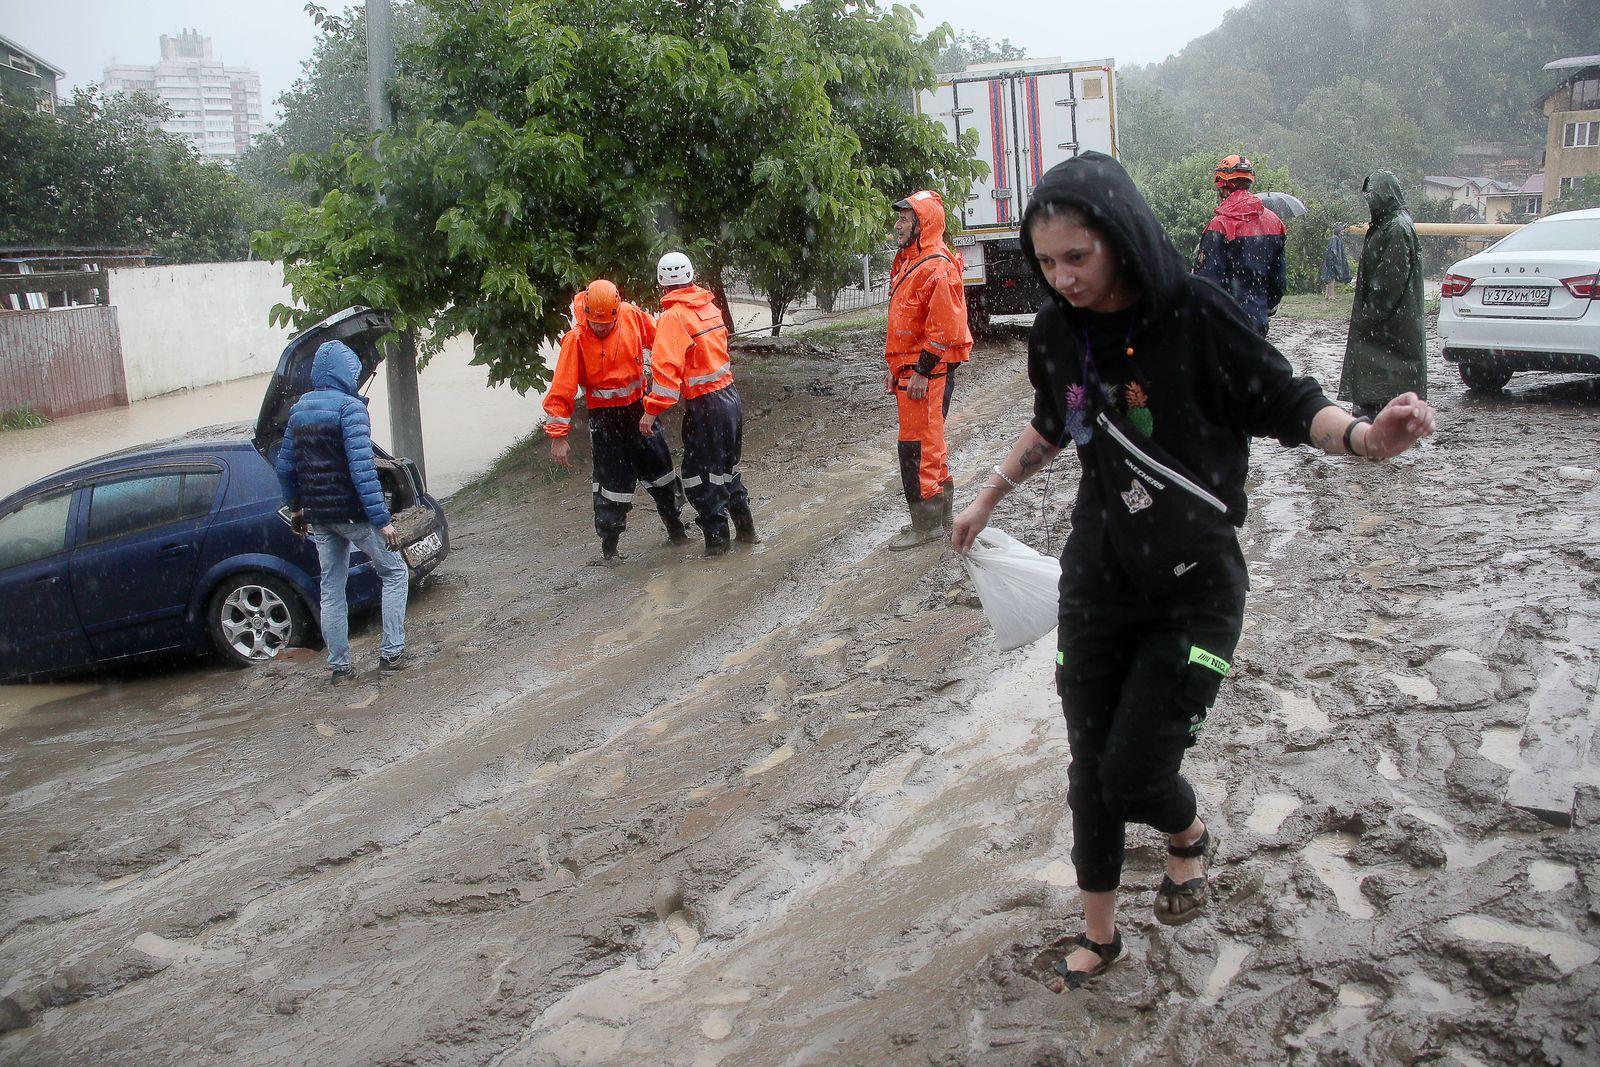 SOCHI, RUSSIA - JULY 5, 2021: Rescuers help residents of the flood-hit neighbourhood of Kudepsta, Khostinsky District. I